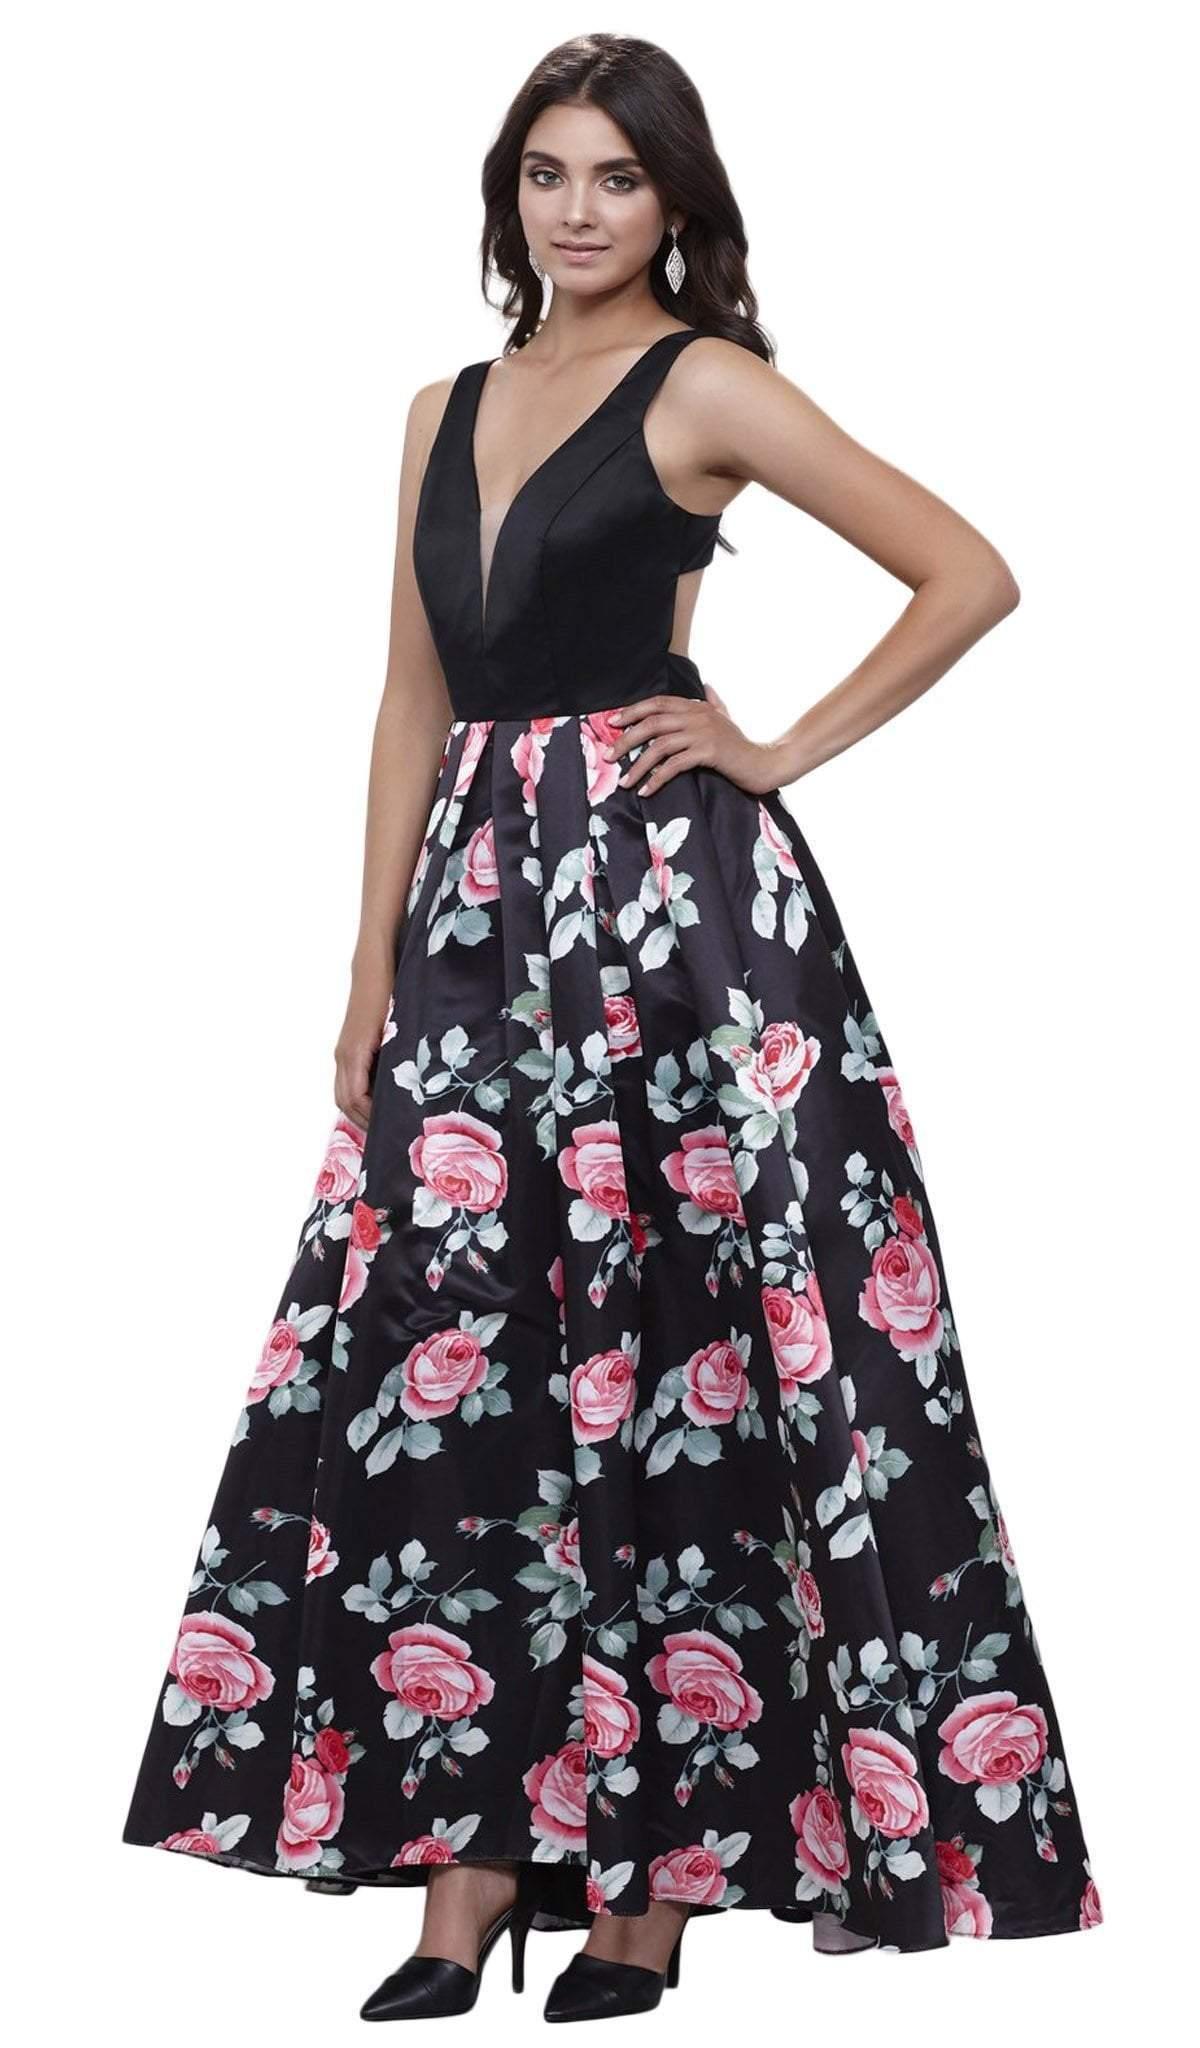 Nox Anabel - 8351 Sleeveless Deep V-Neck Floral Evening Dress